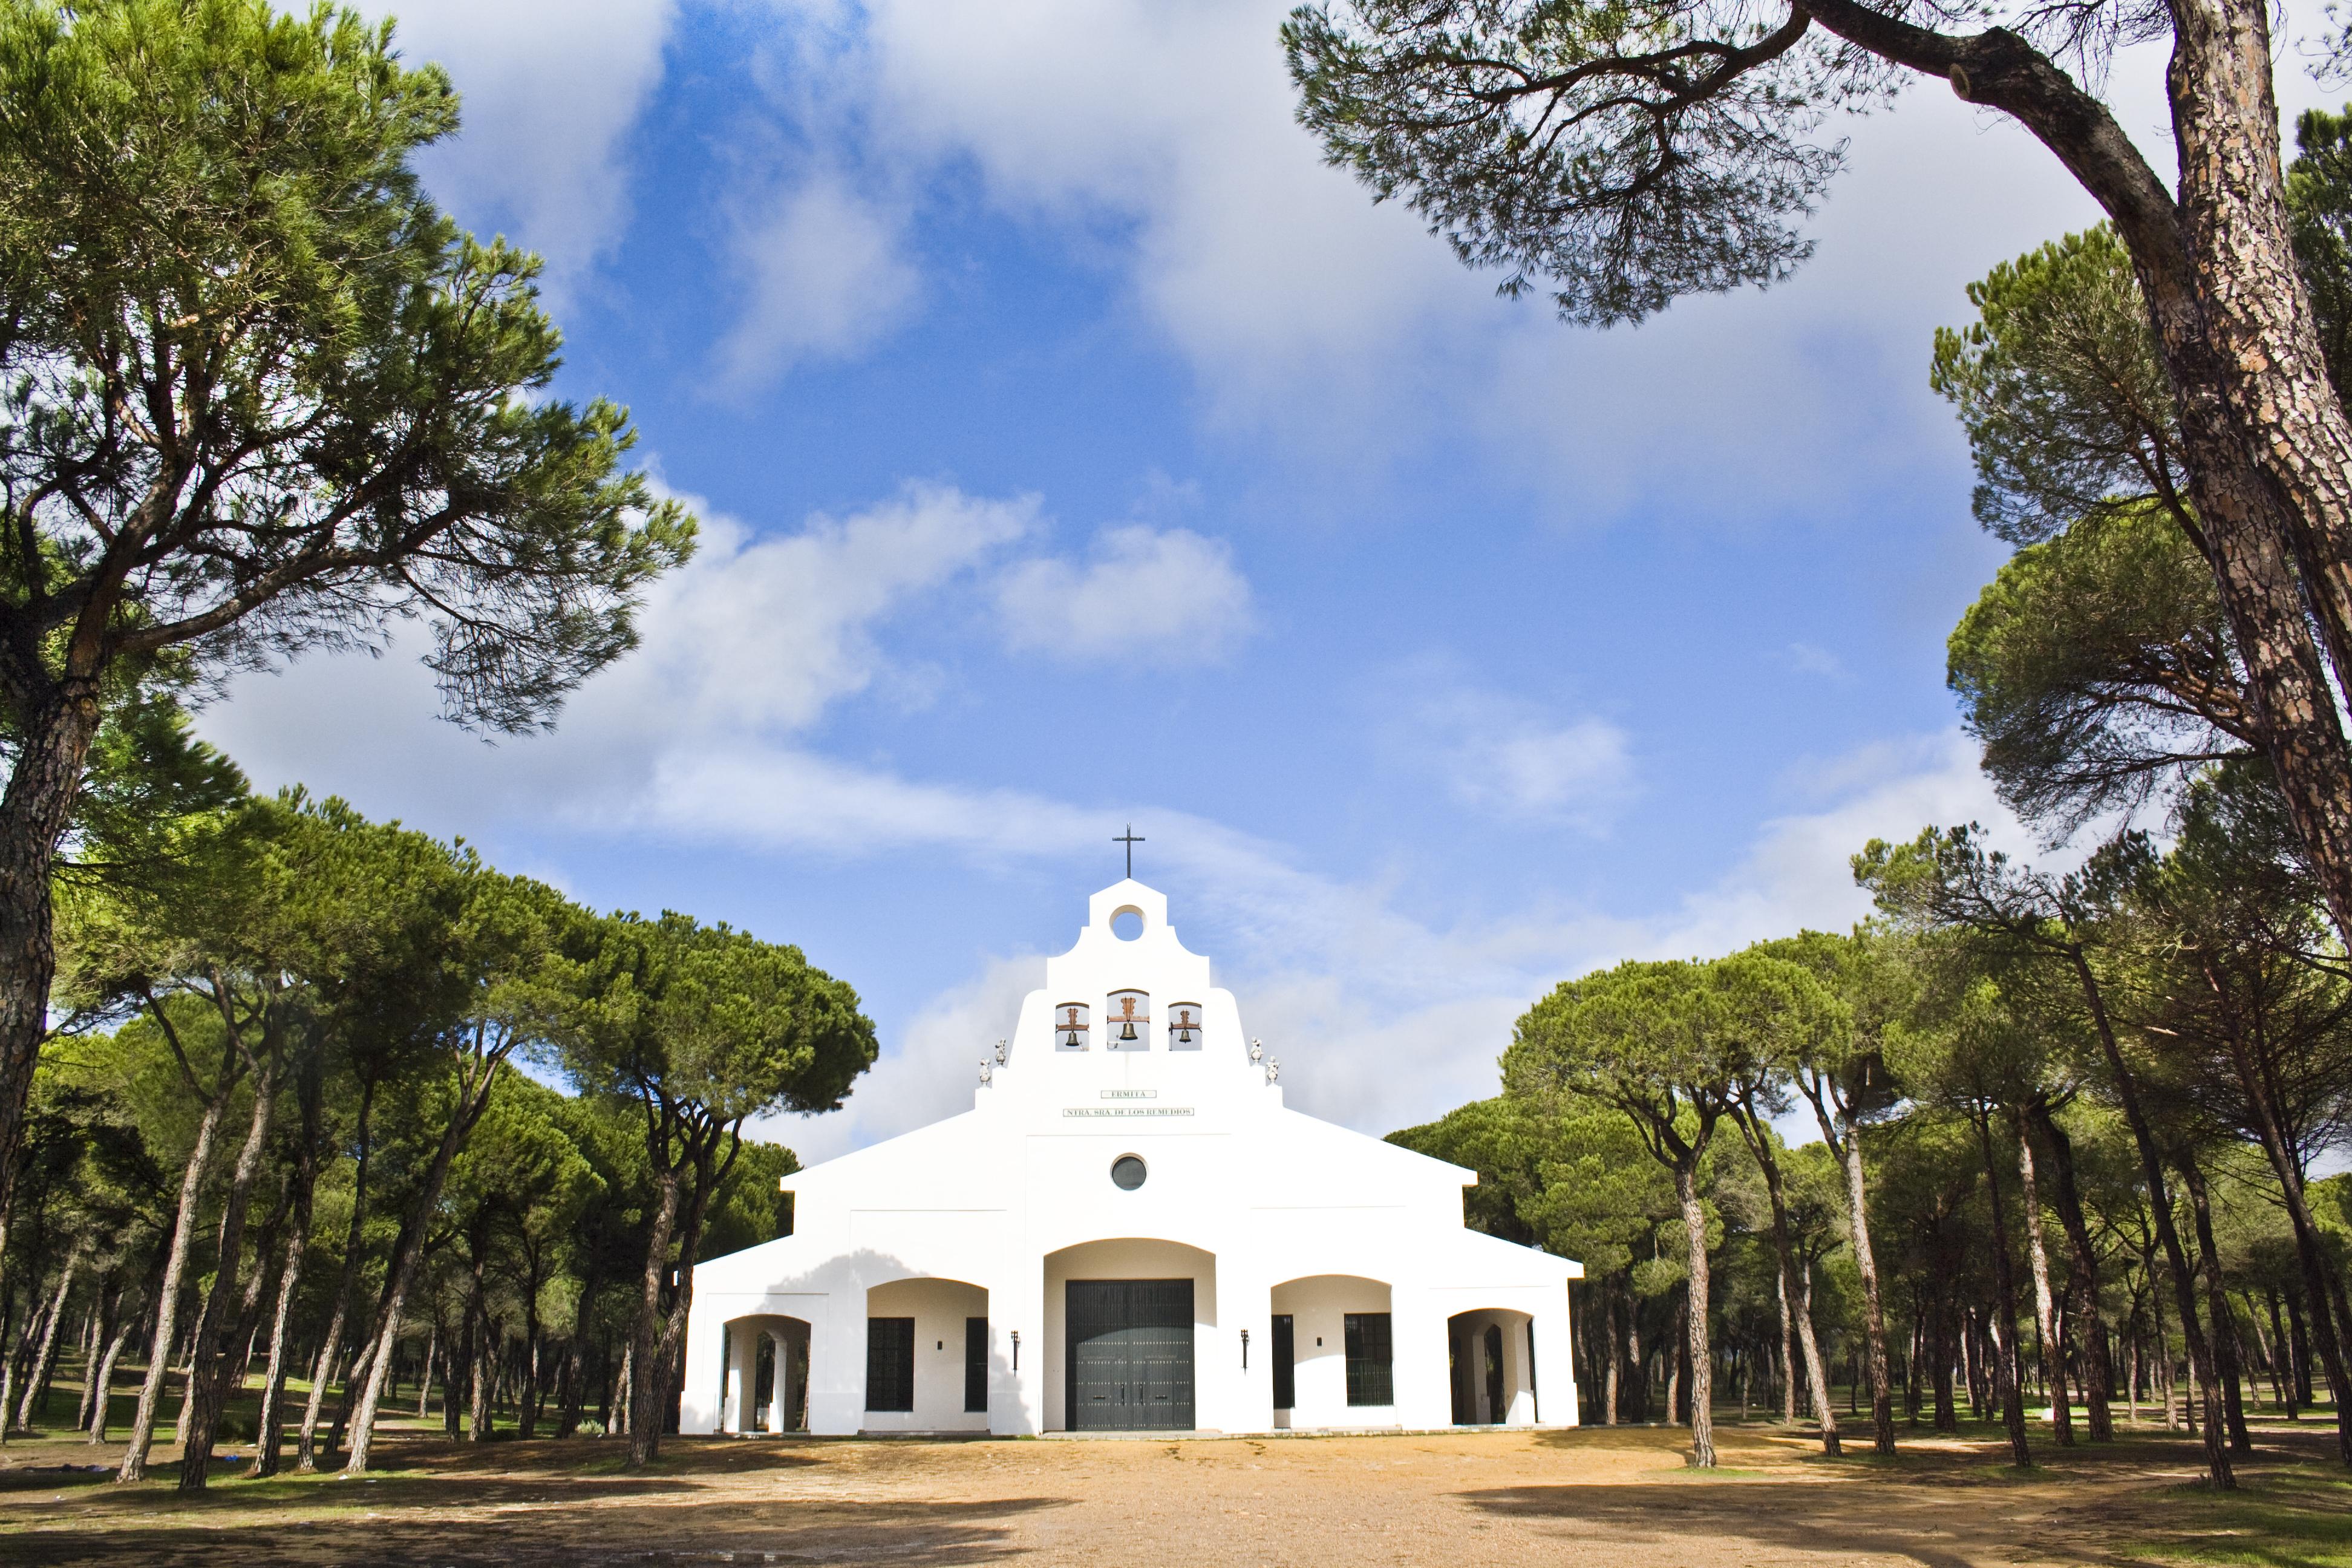 Archivo:Ermita aljaraque.jpg - Wikipedia, la enciclopedia libre